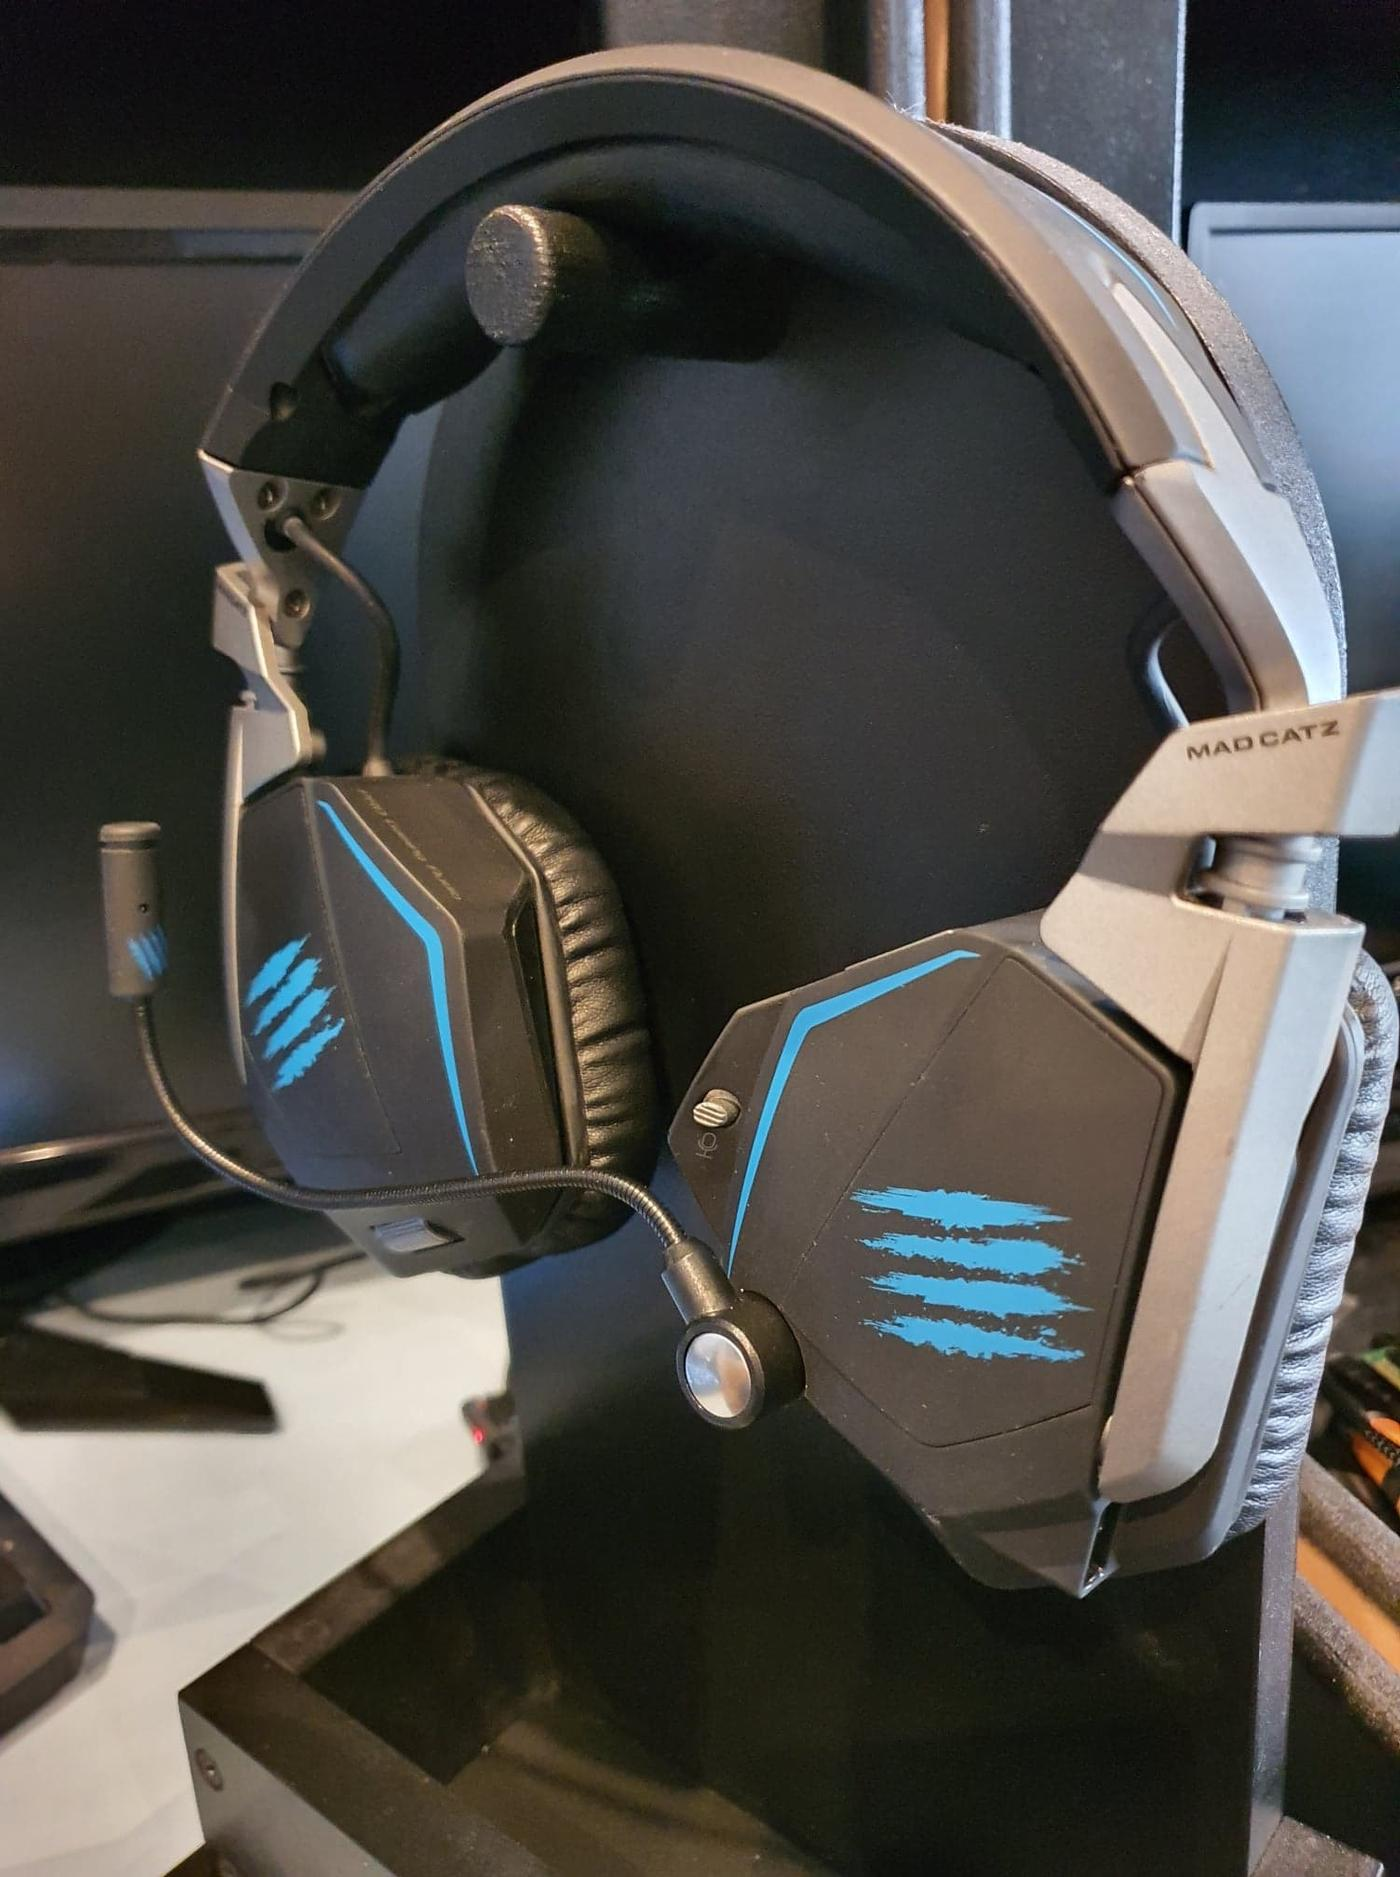 Refurbished Madcatz F.R.E.Q 7.1 Wired Headset